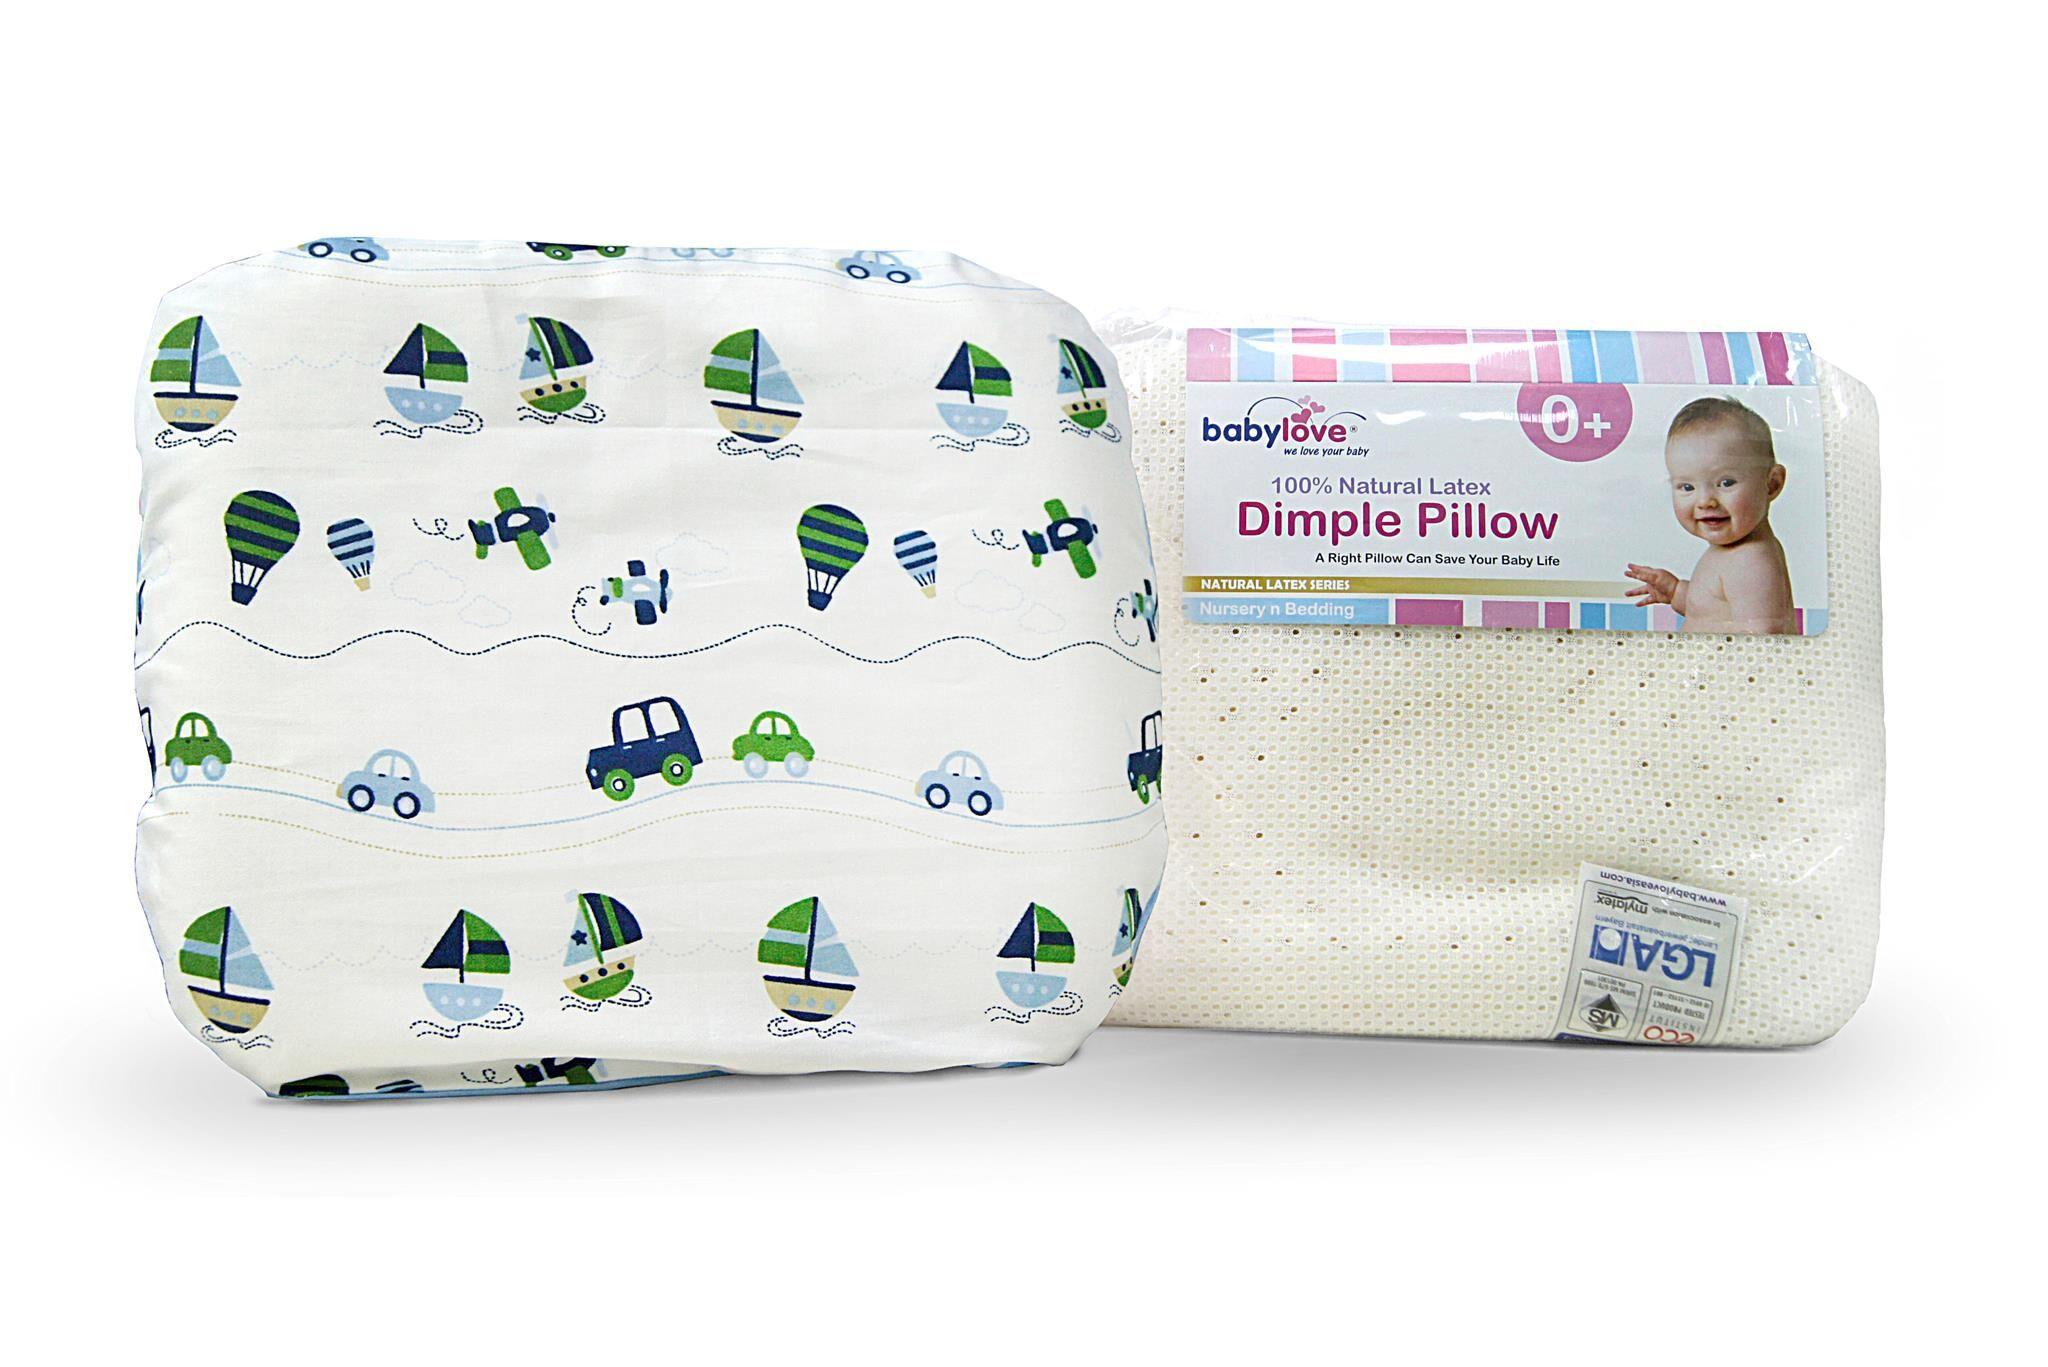 BabyLove Premium Newborn Pillowcase 30x25cm for La